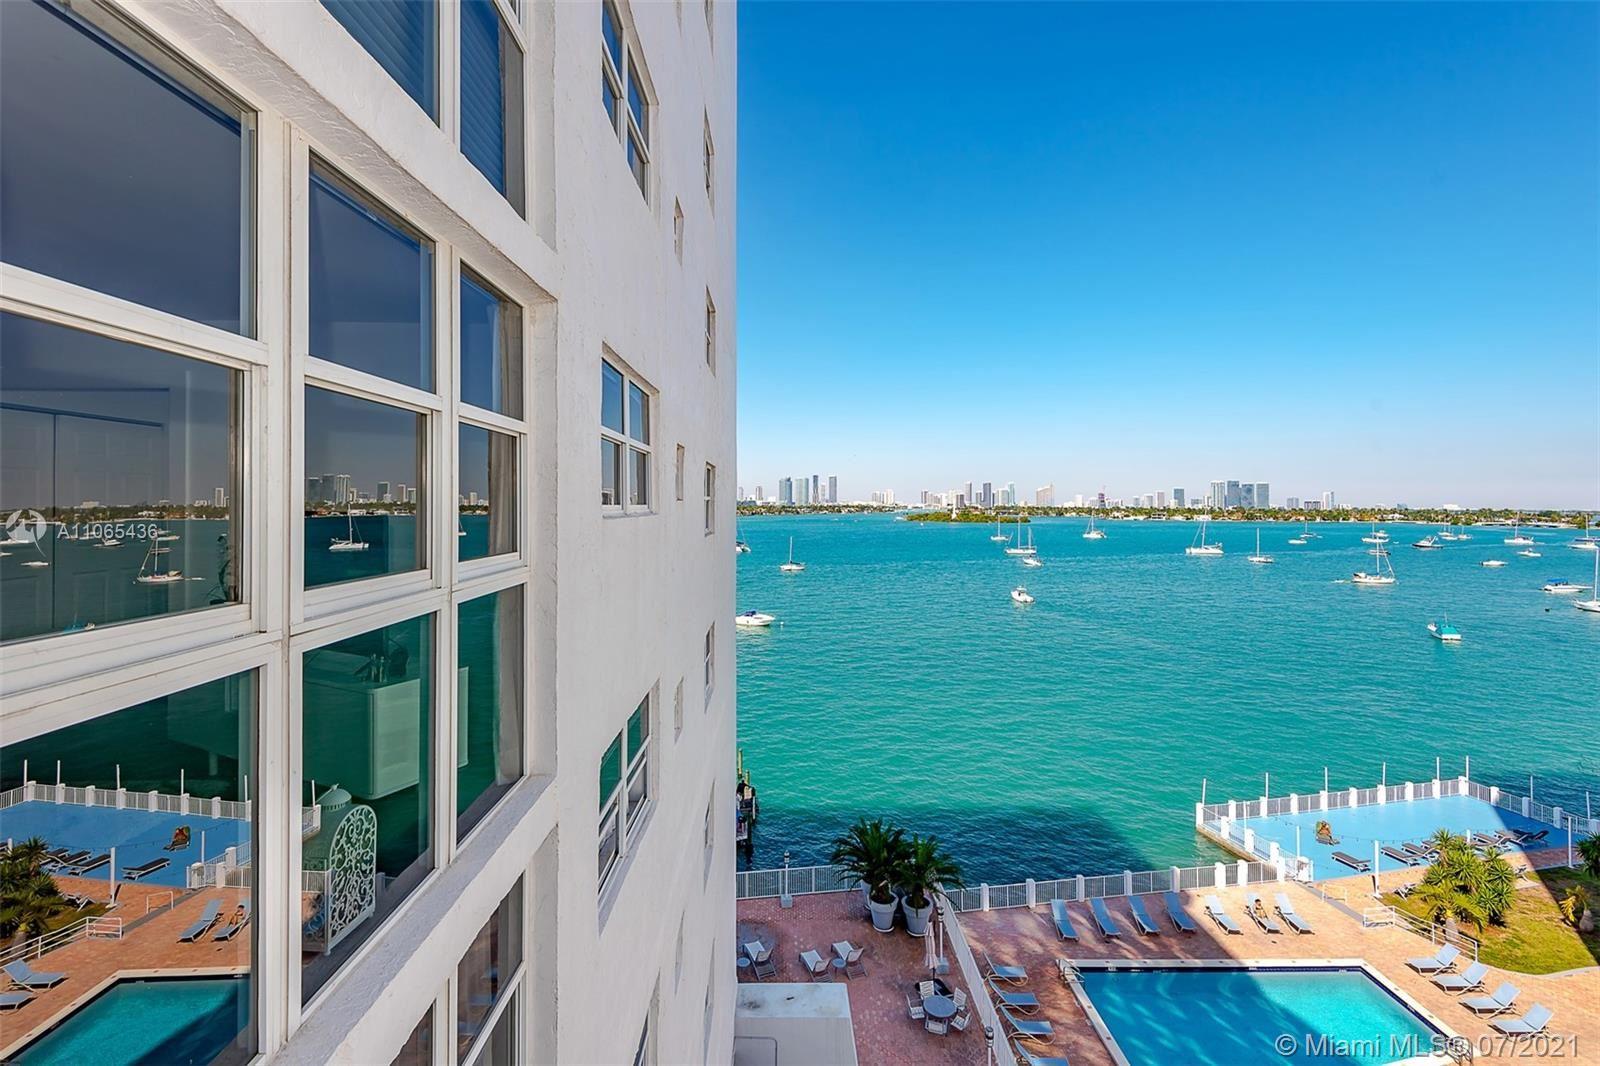 1228 West Ave #503, Miami Beach, FL 33139 - #: A11065436